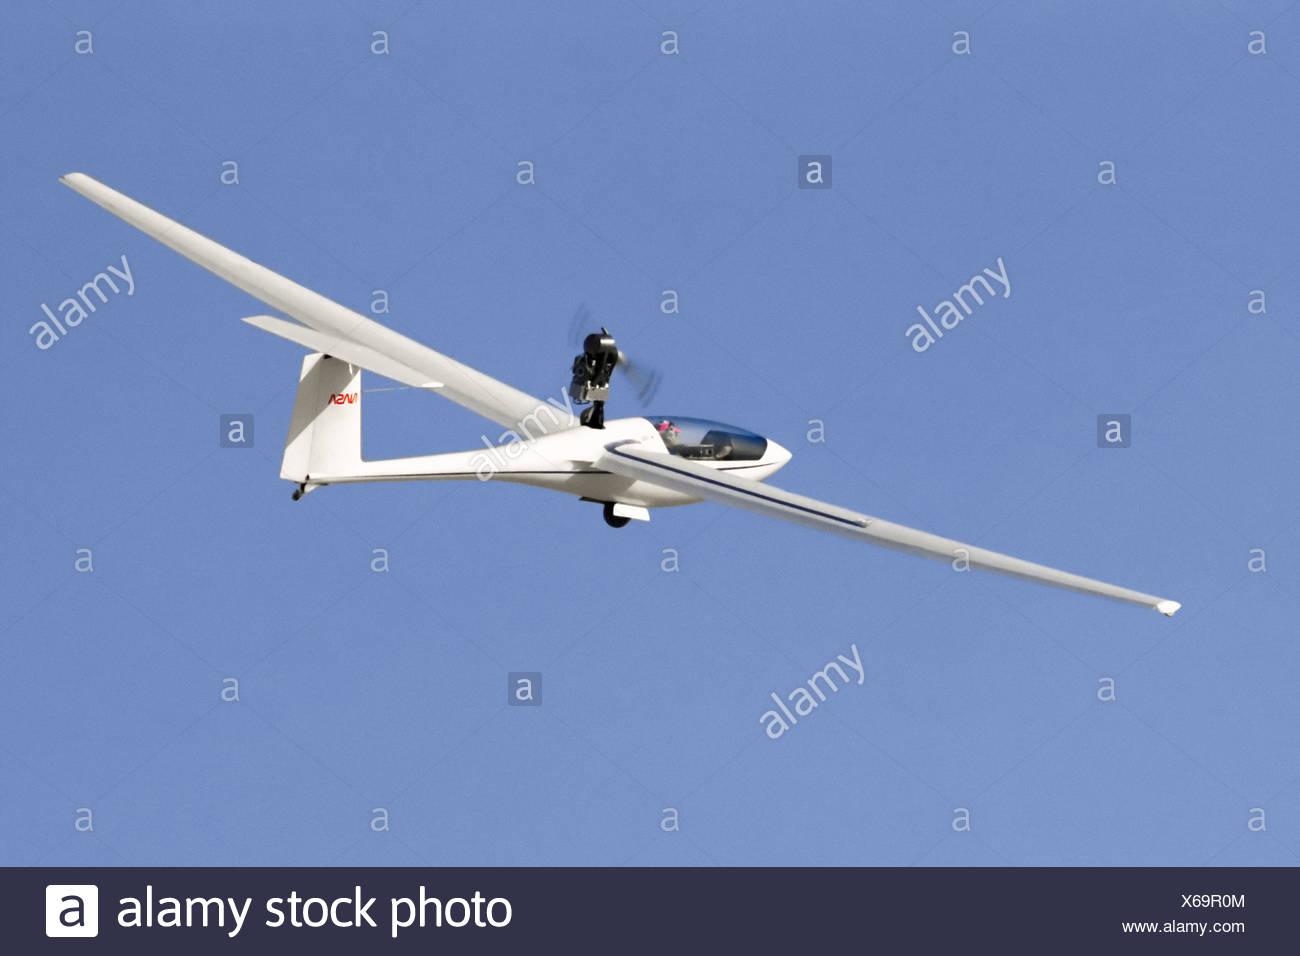 PIK-20 Aircraft in Flight - Stock Image